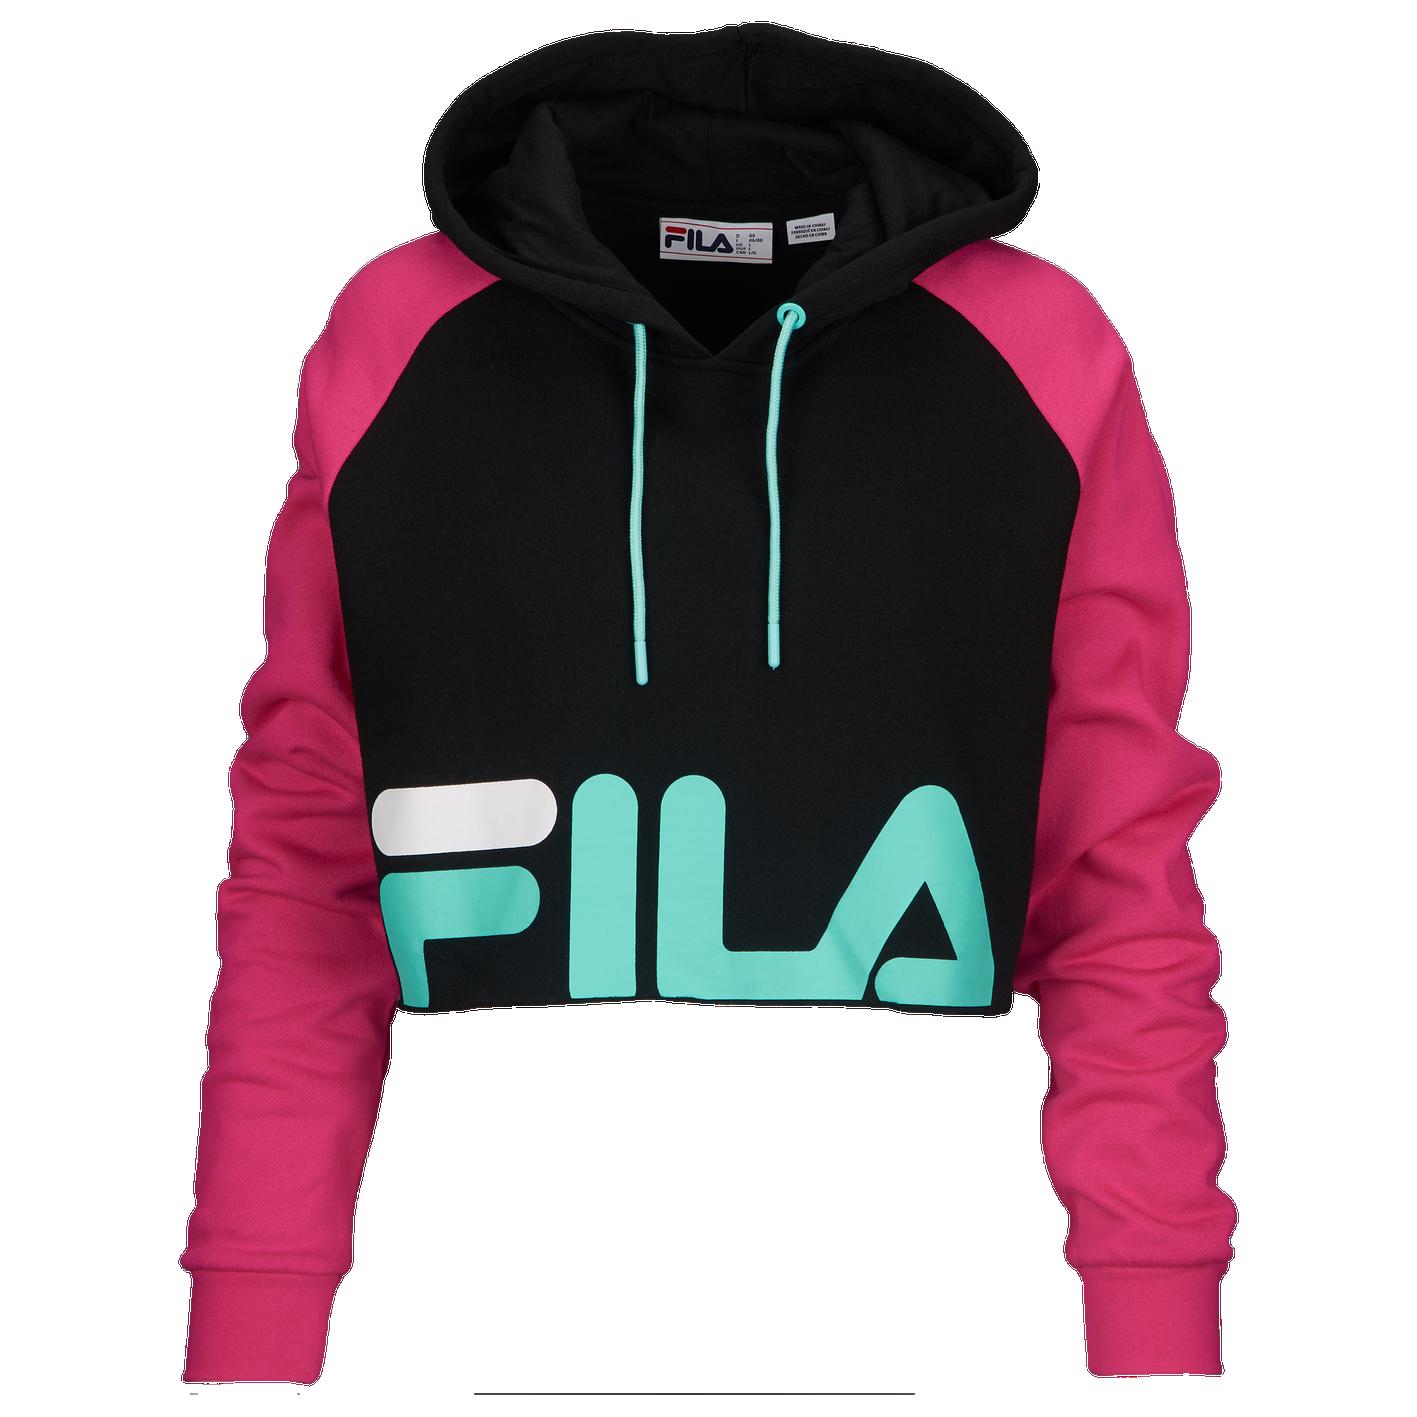 892d4c6a9401 Fila Luciana Hoodie - Women s - Casual - Clothing - Pink Black Aqua